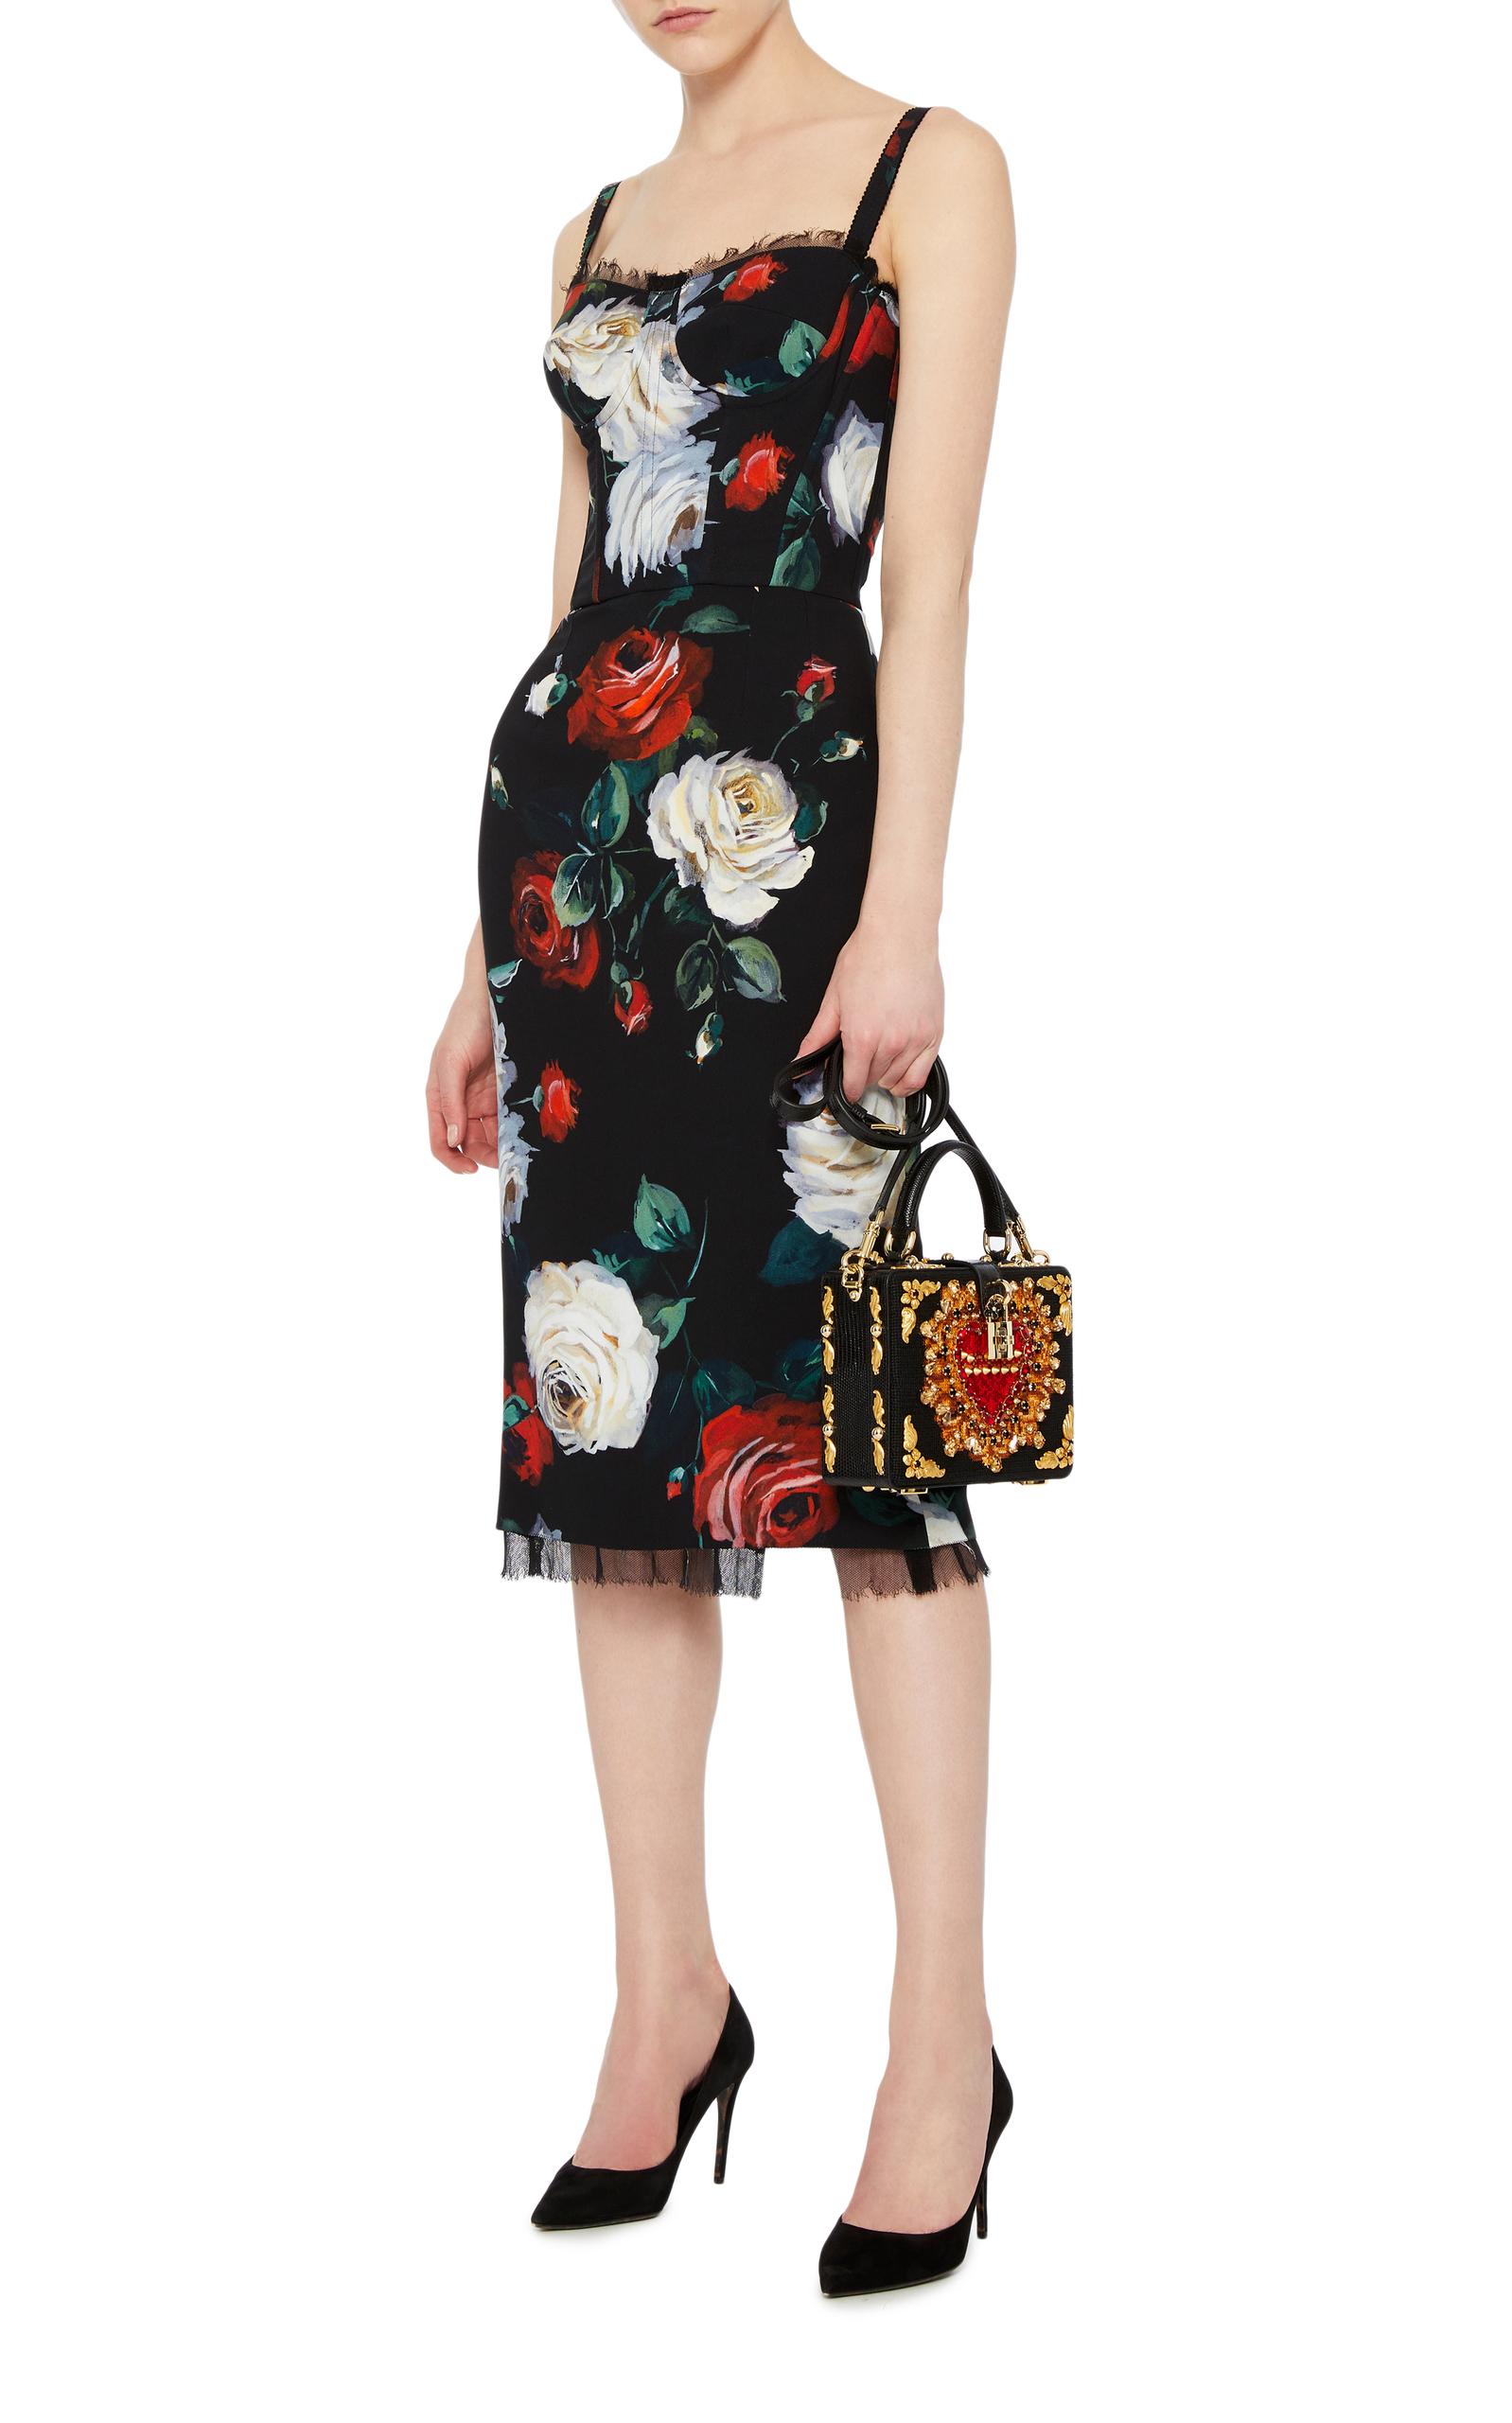 Floral Cocktail Dress by Dolce & Gabbana | Moda Operandi